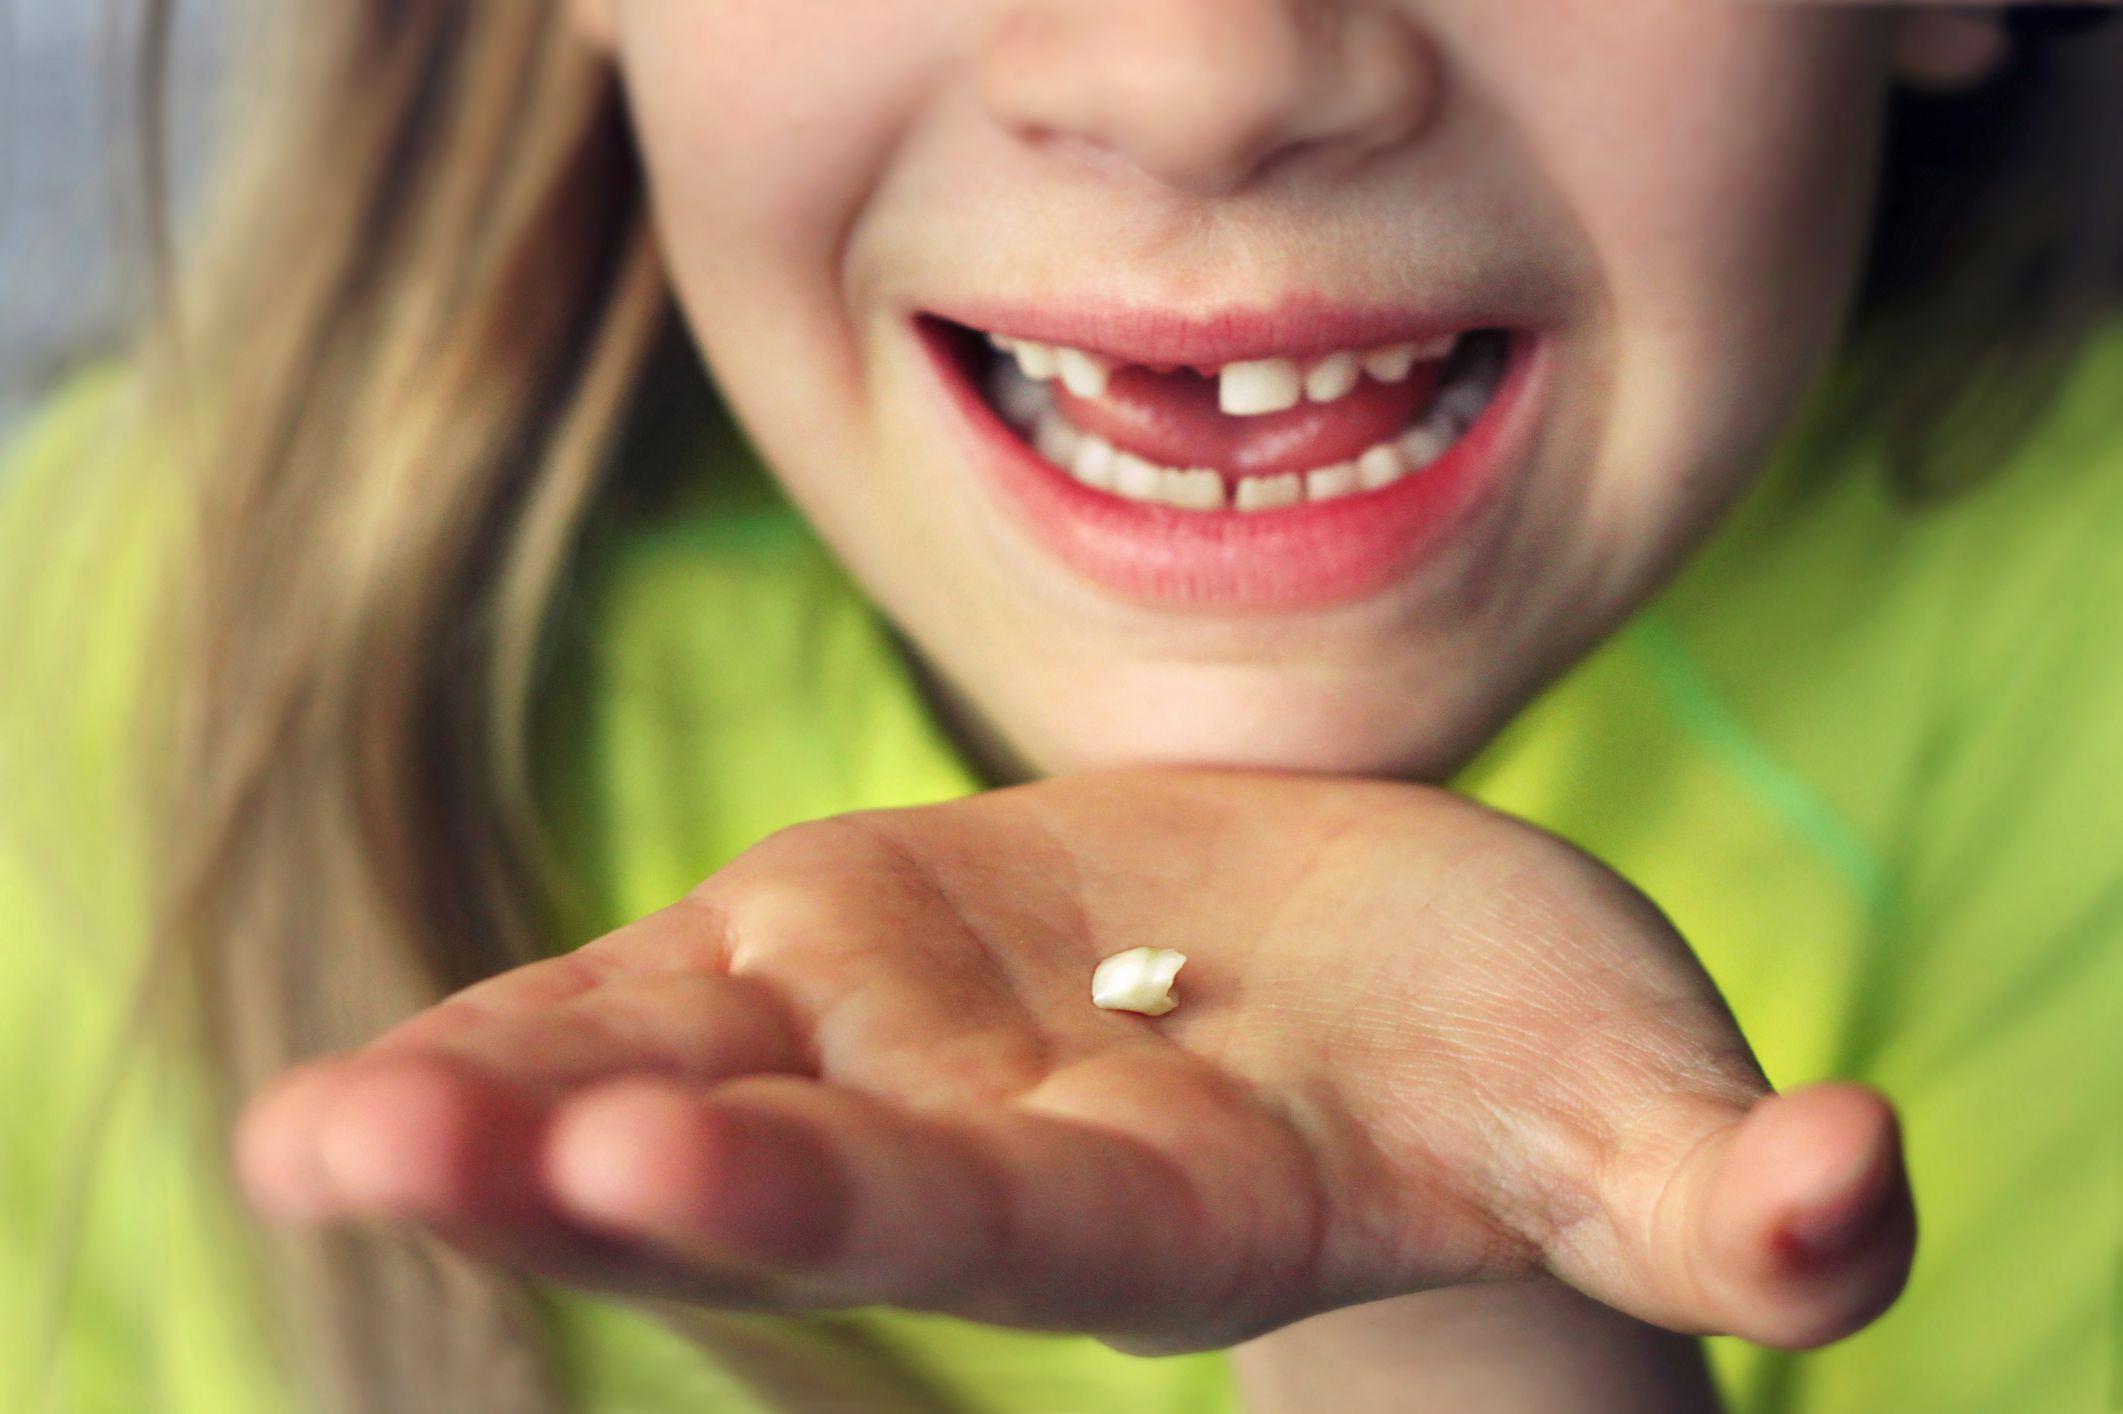 Udalenie-molochnyh-zubov-u-detej